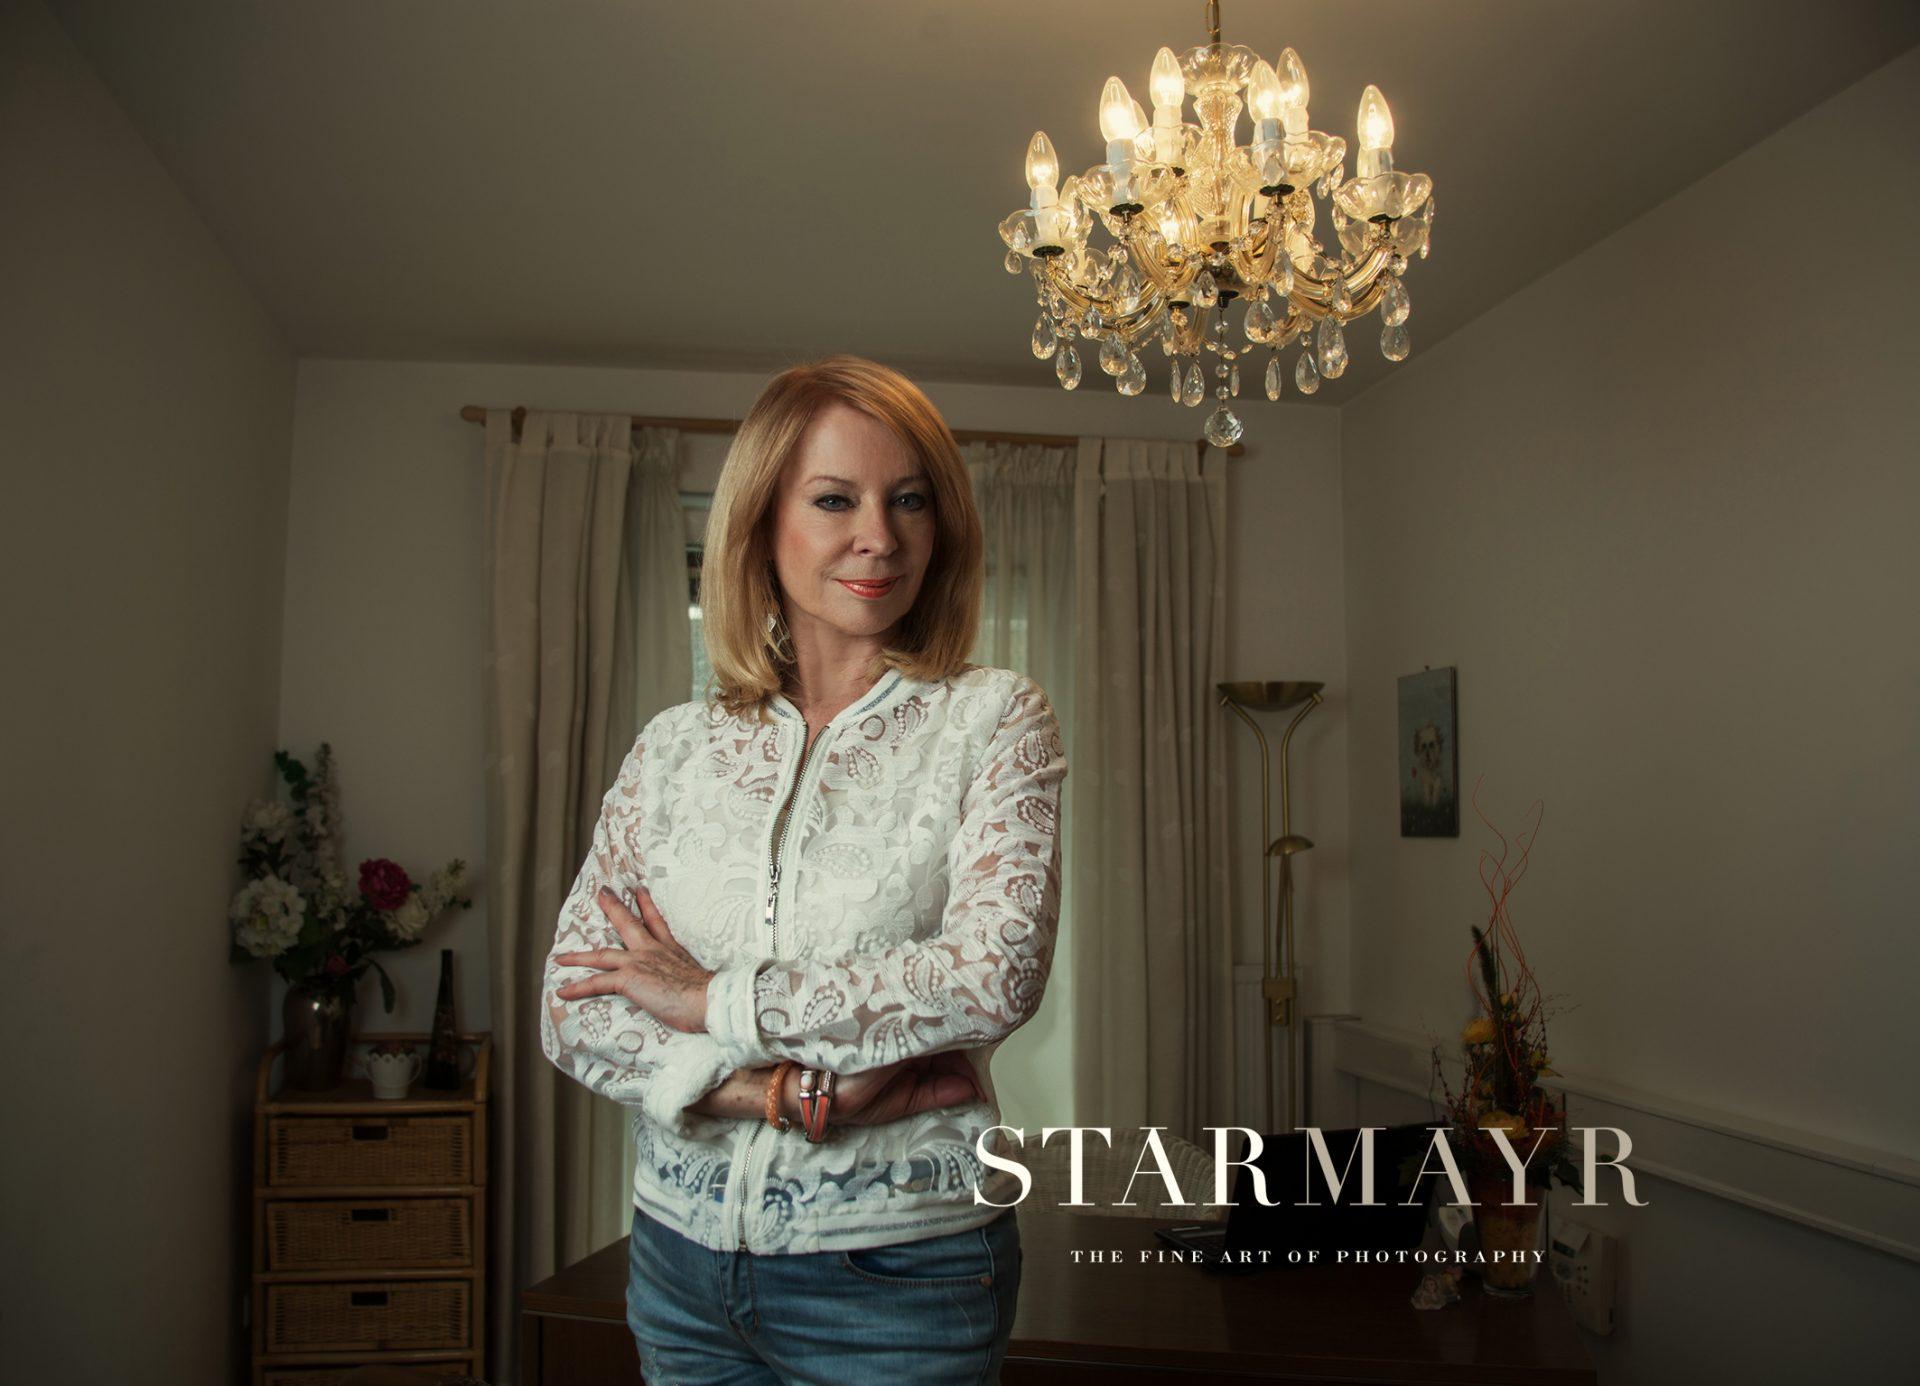 Sabine Starmayr, Fotografin, Gerda Rogers, Astrologin 4